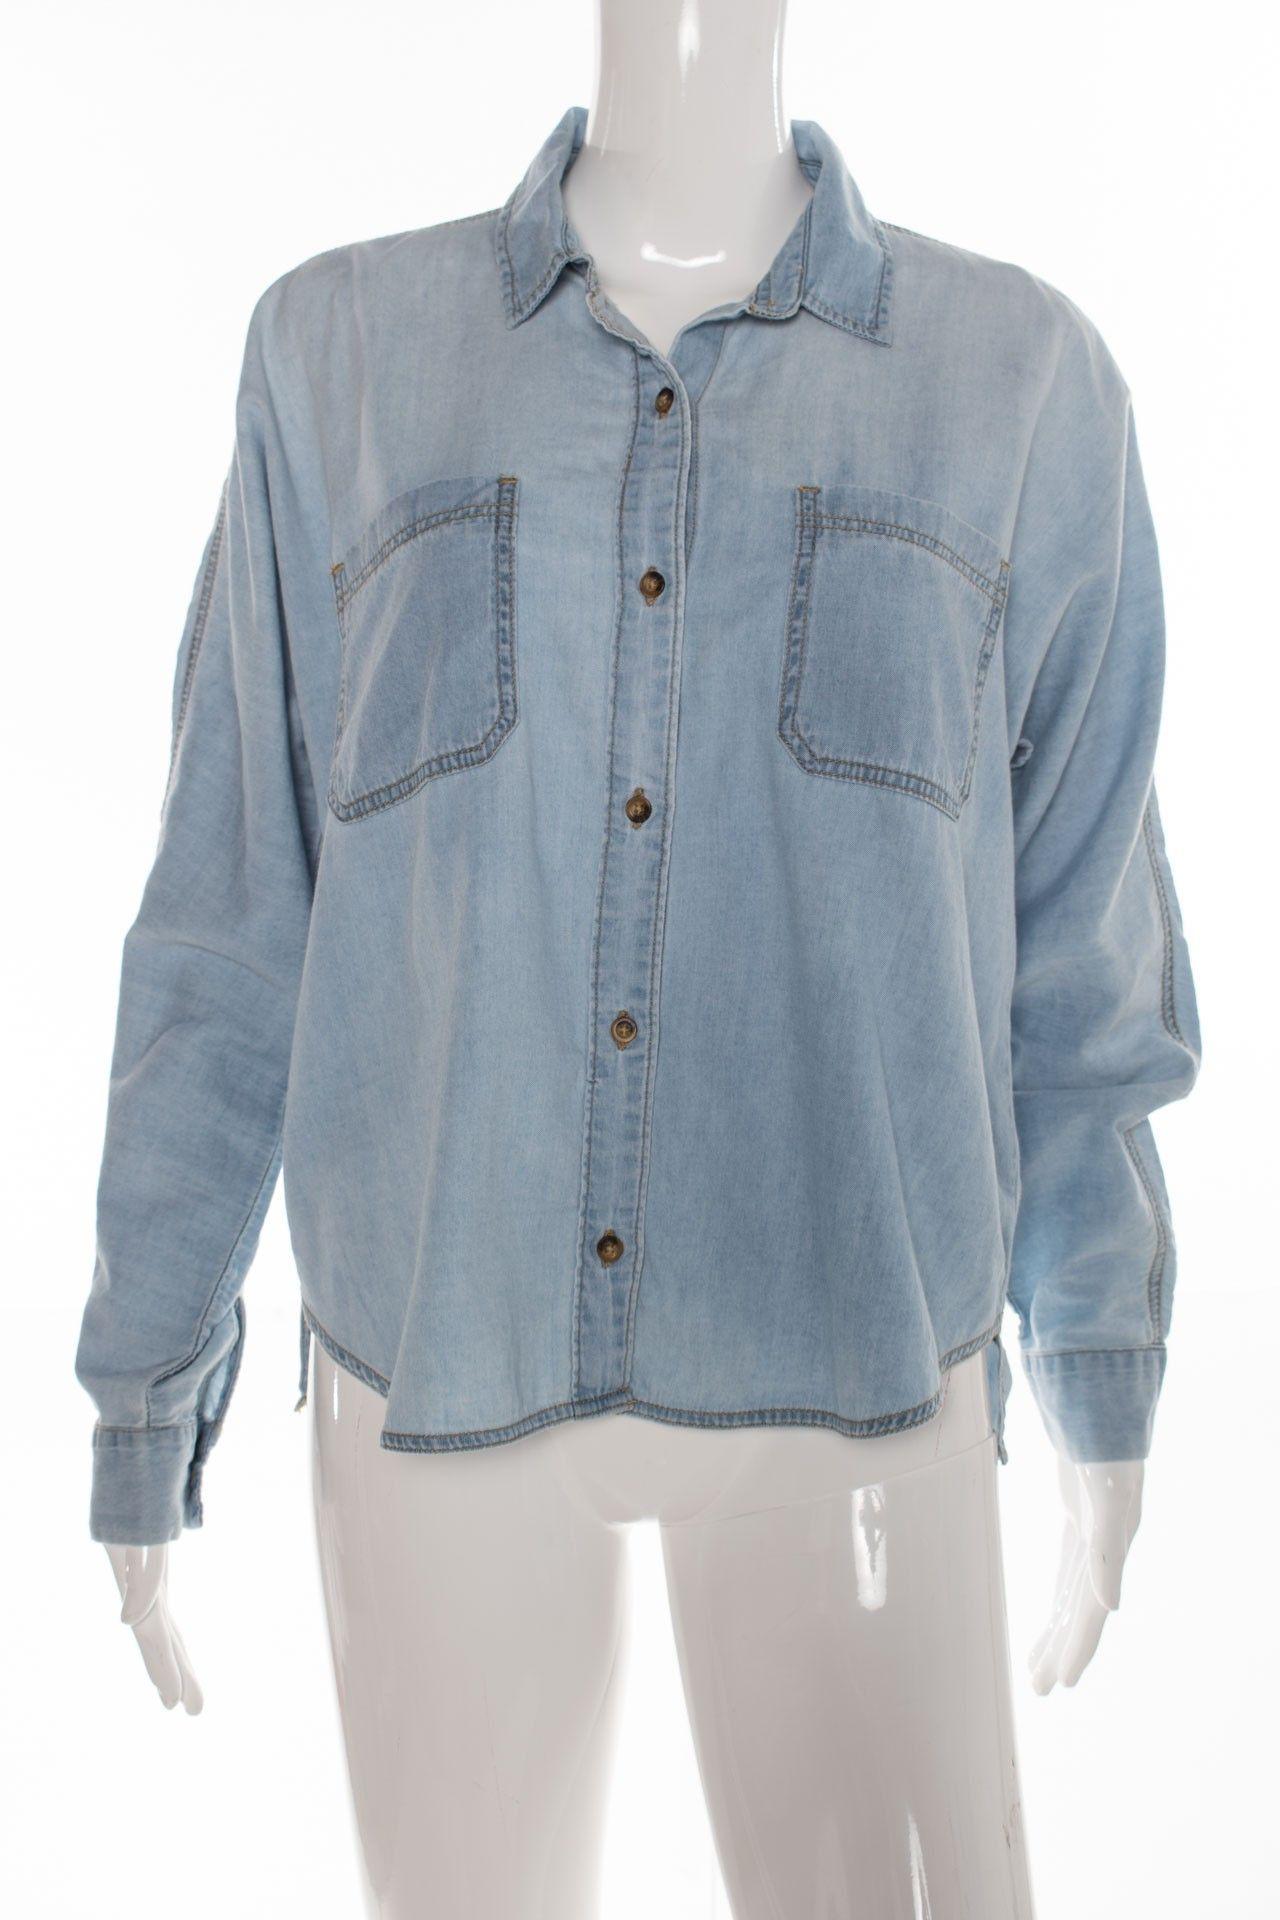 Topshop - Camisa Jeans - Foto 1